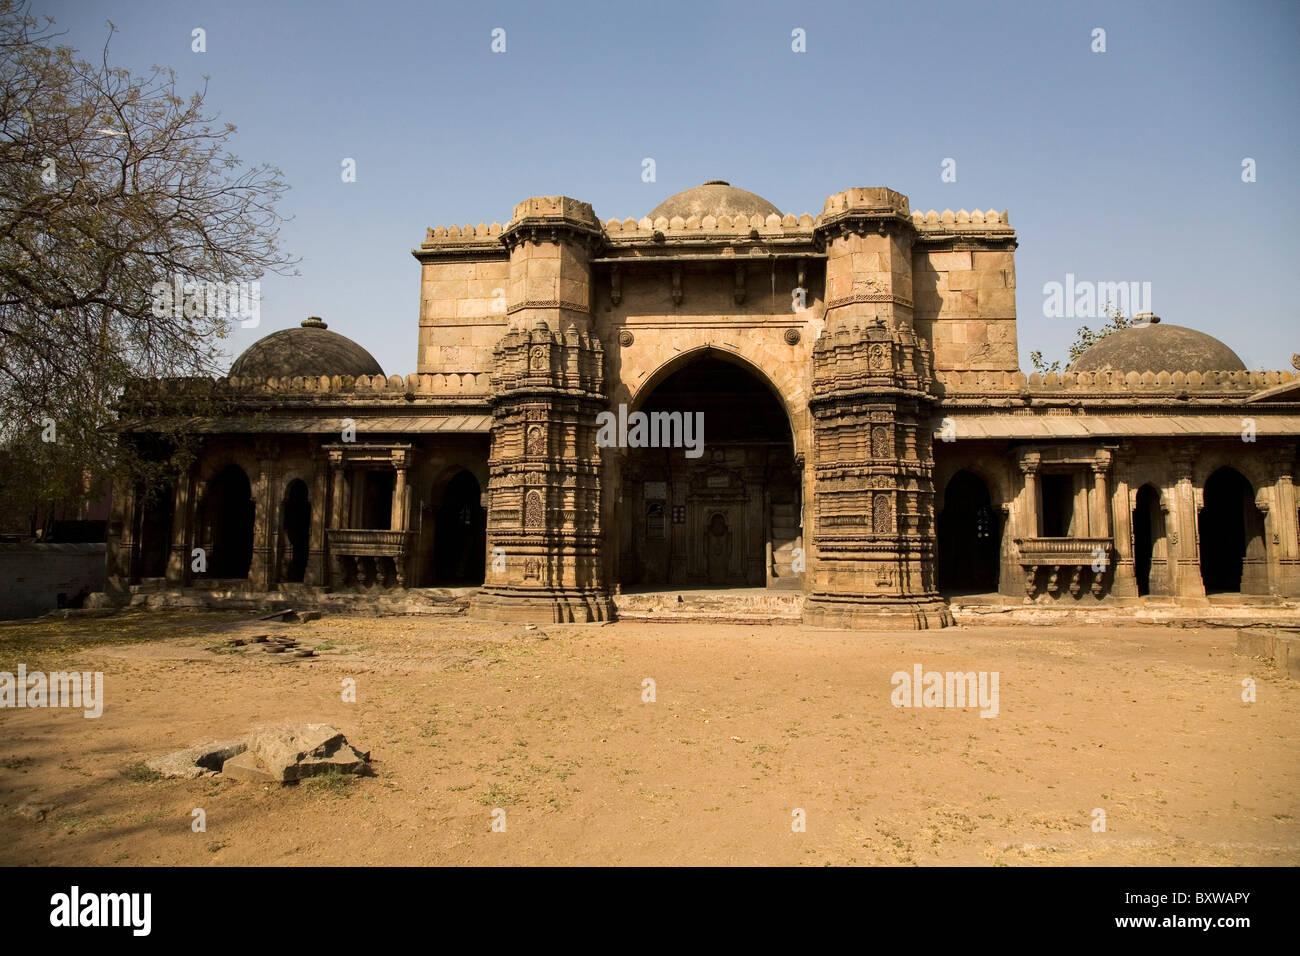 The Bai Harir Mosque at Ahmedabad, Gujarat, India. Stock Photo